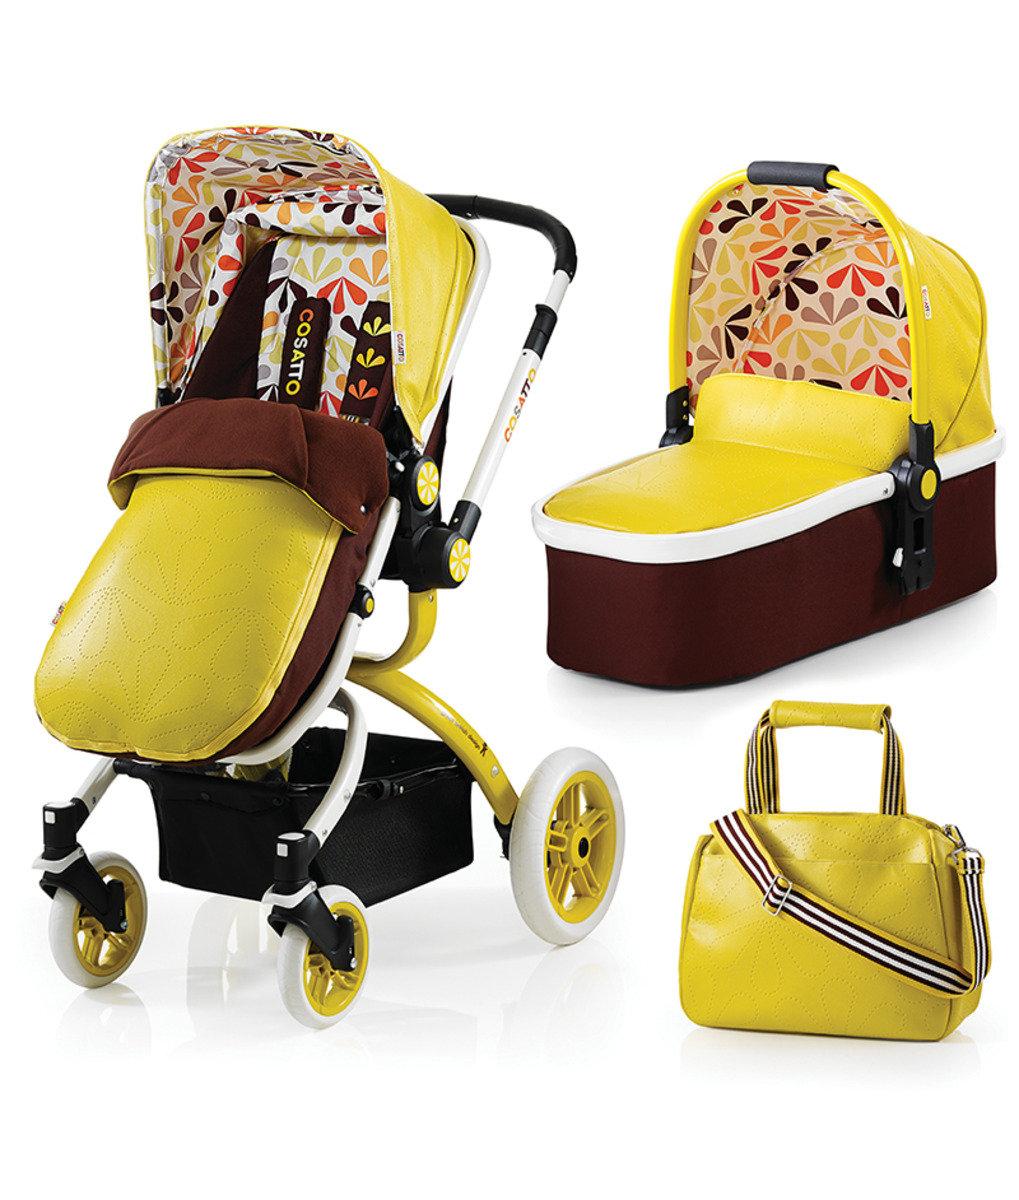 英國 Cosatto Ooba 嬰兒3合1組合推車 - Marzipan